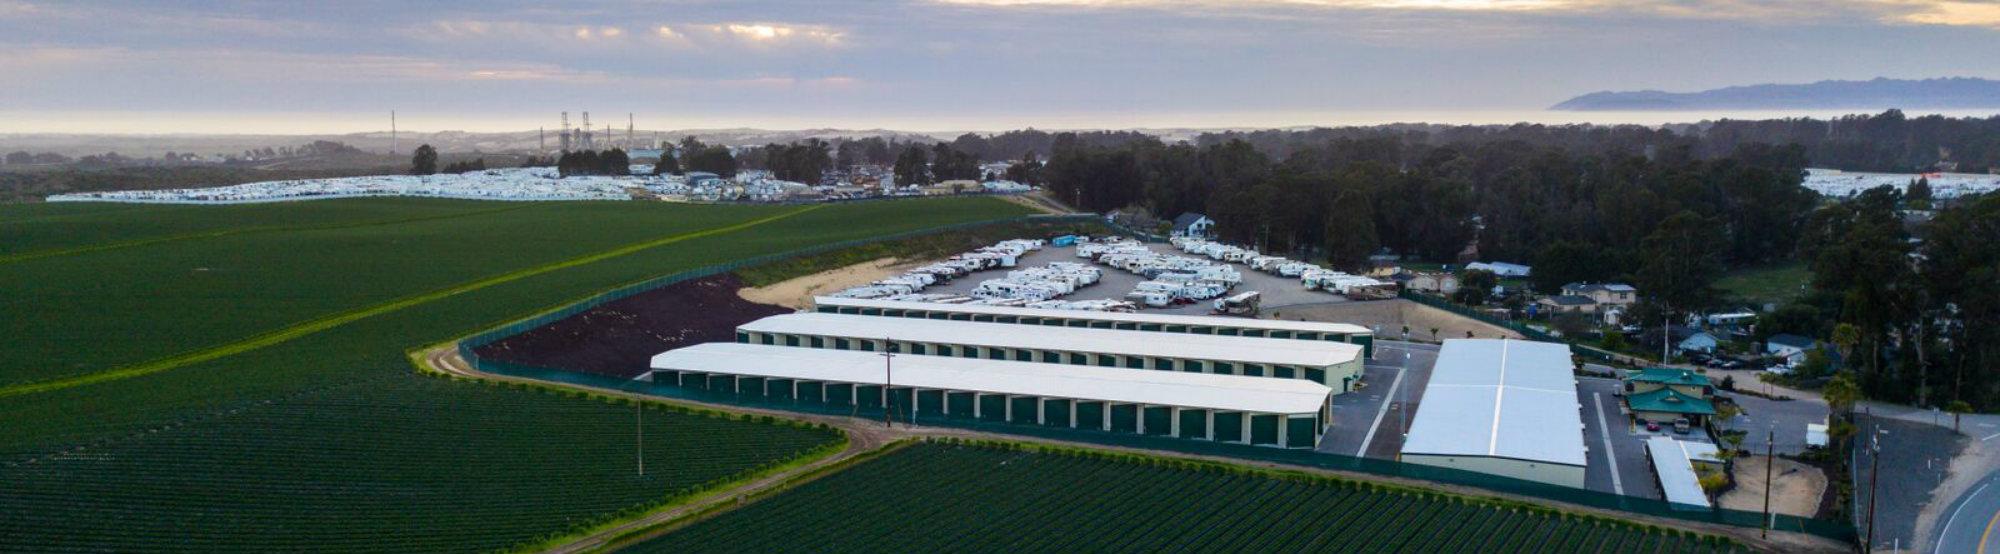 Monarch Mega Storage Exterior Aerial View Side